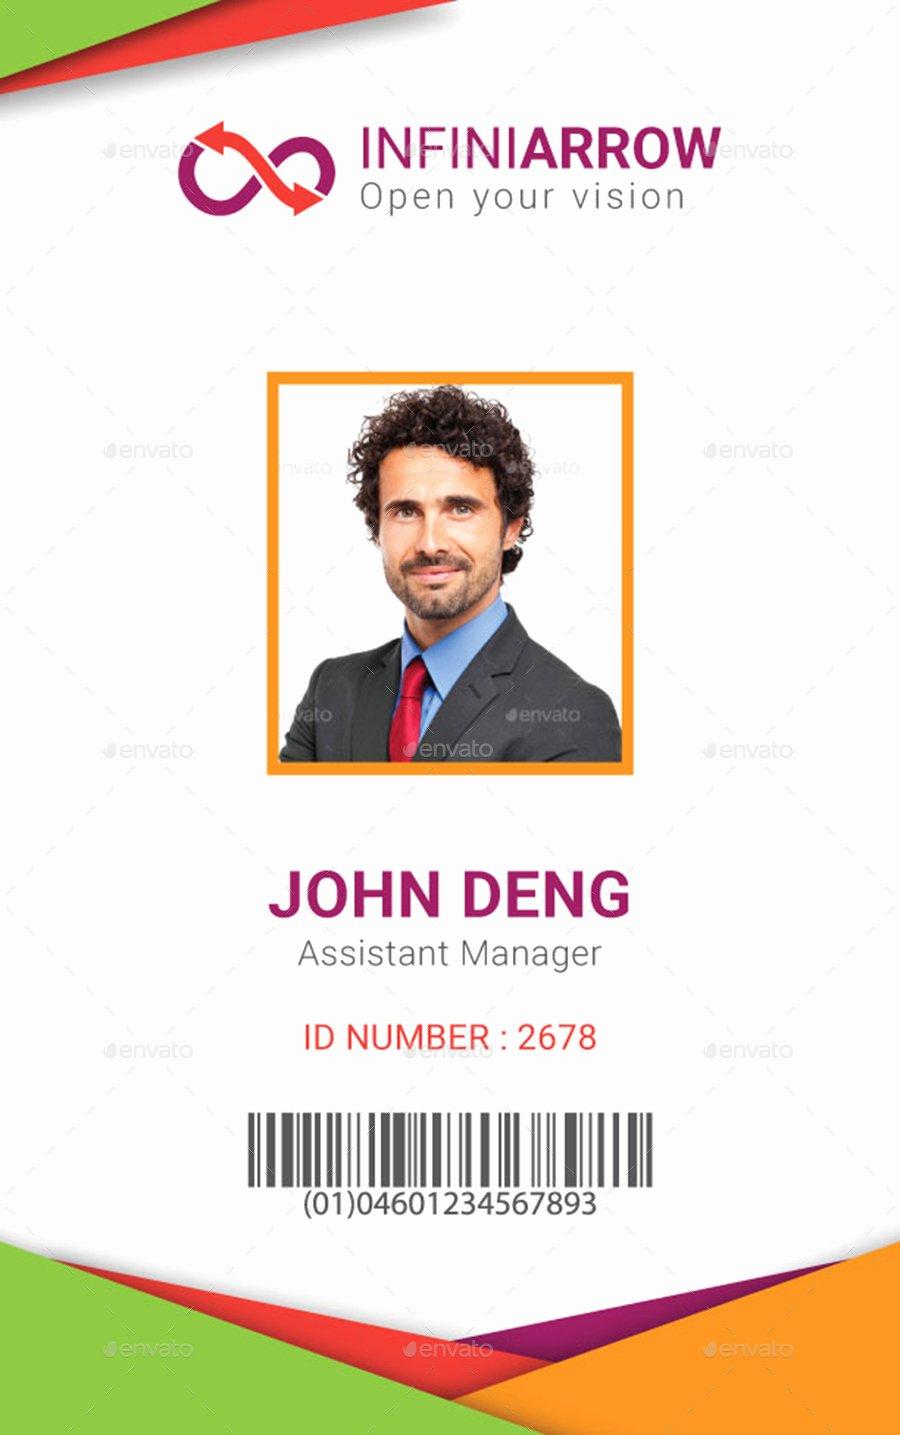 Id Card Template Photoshop Elegant Multipurpose Business Id Card Template by Dotnpix